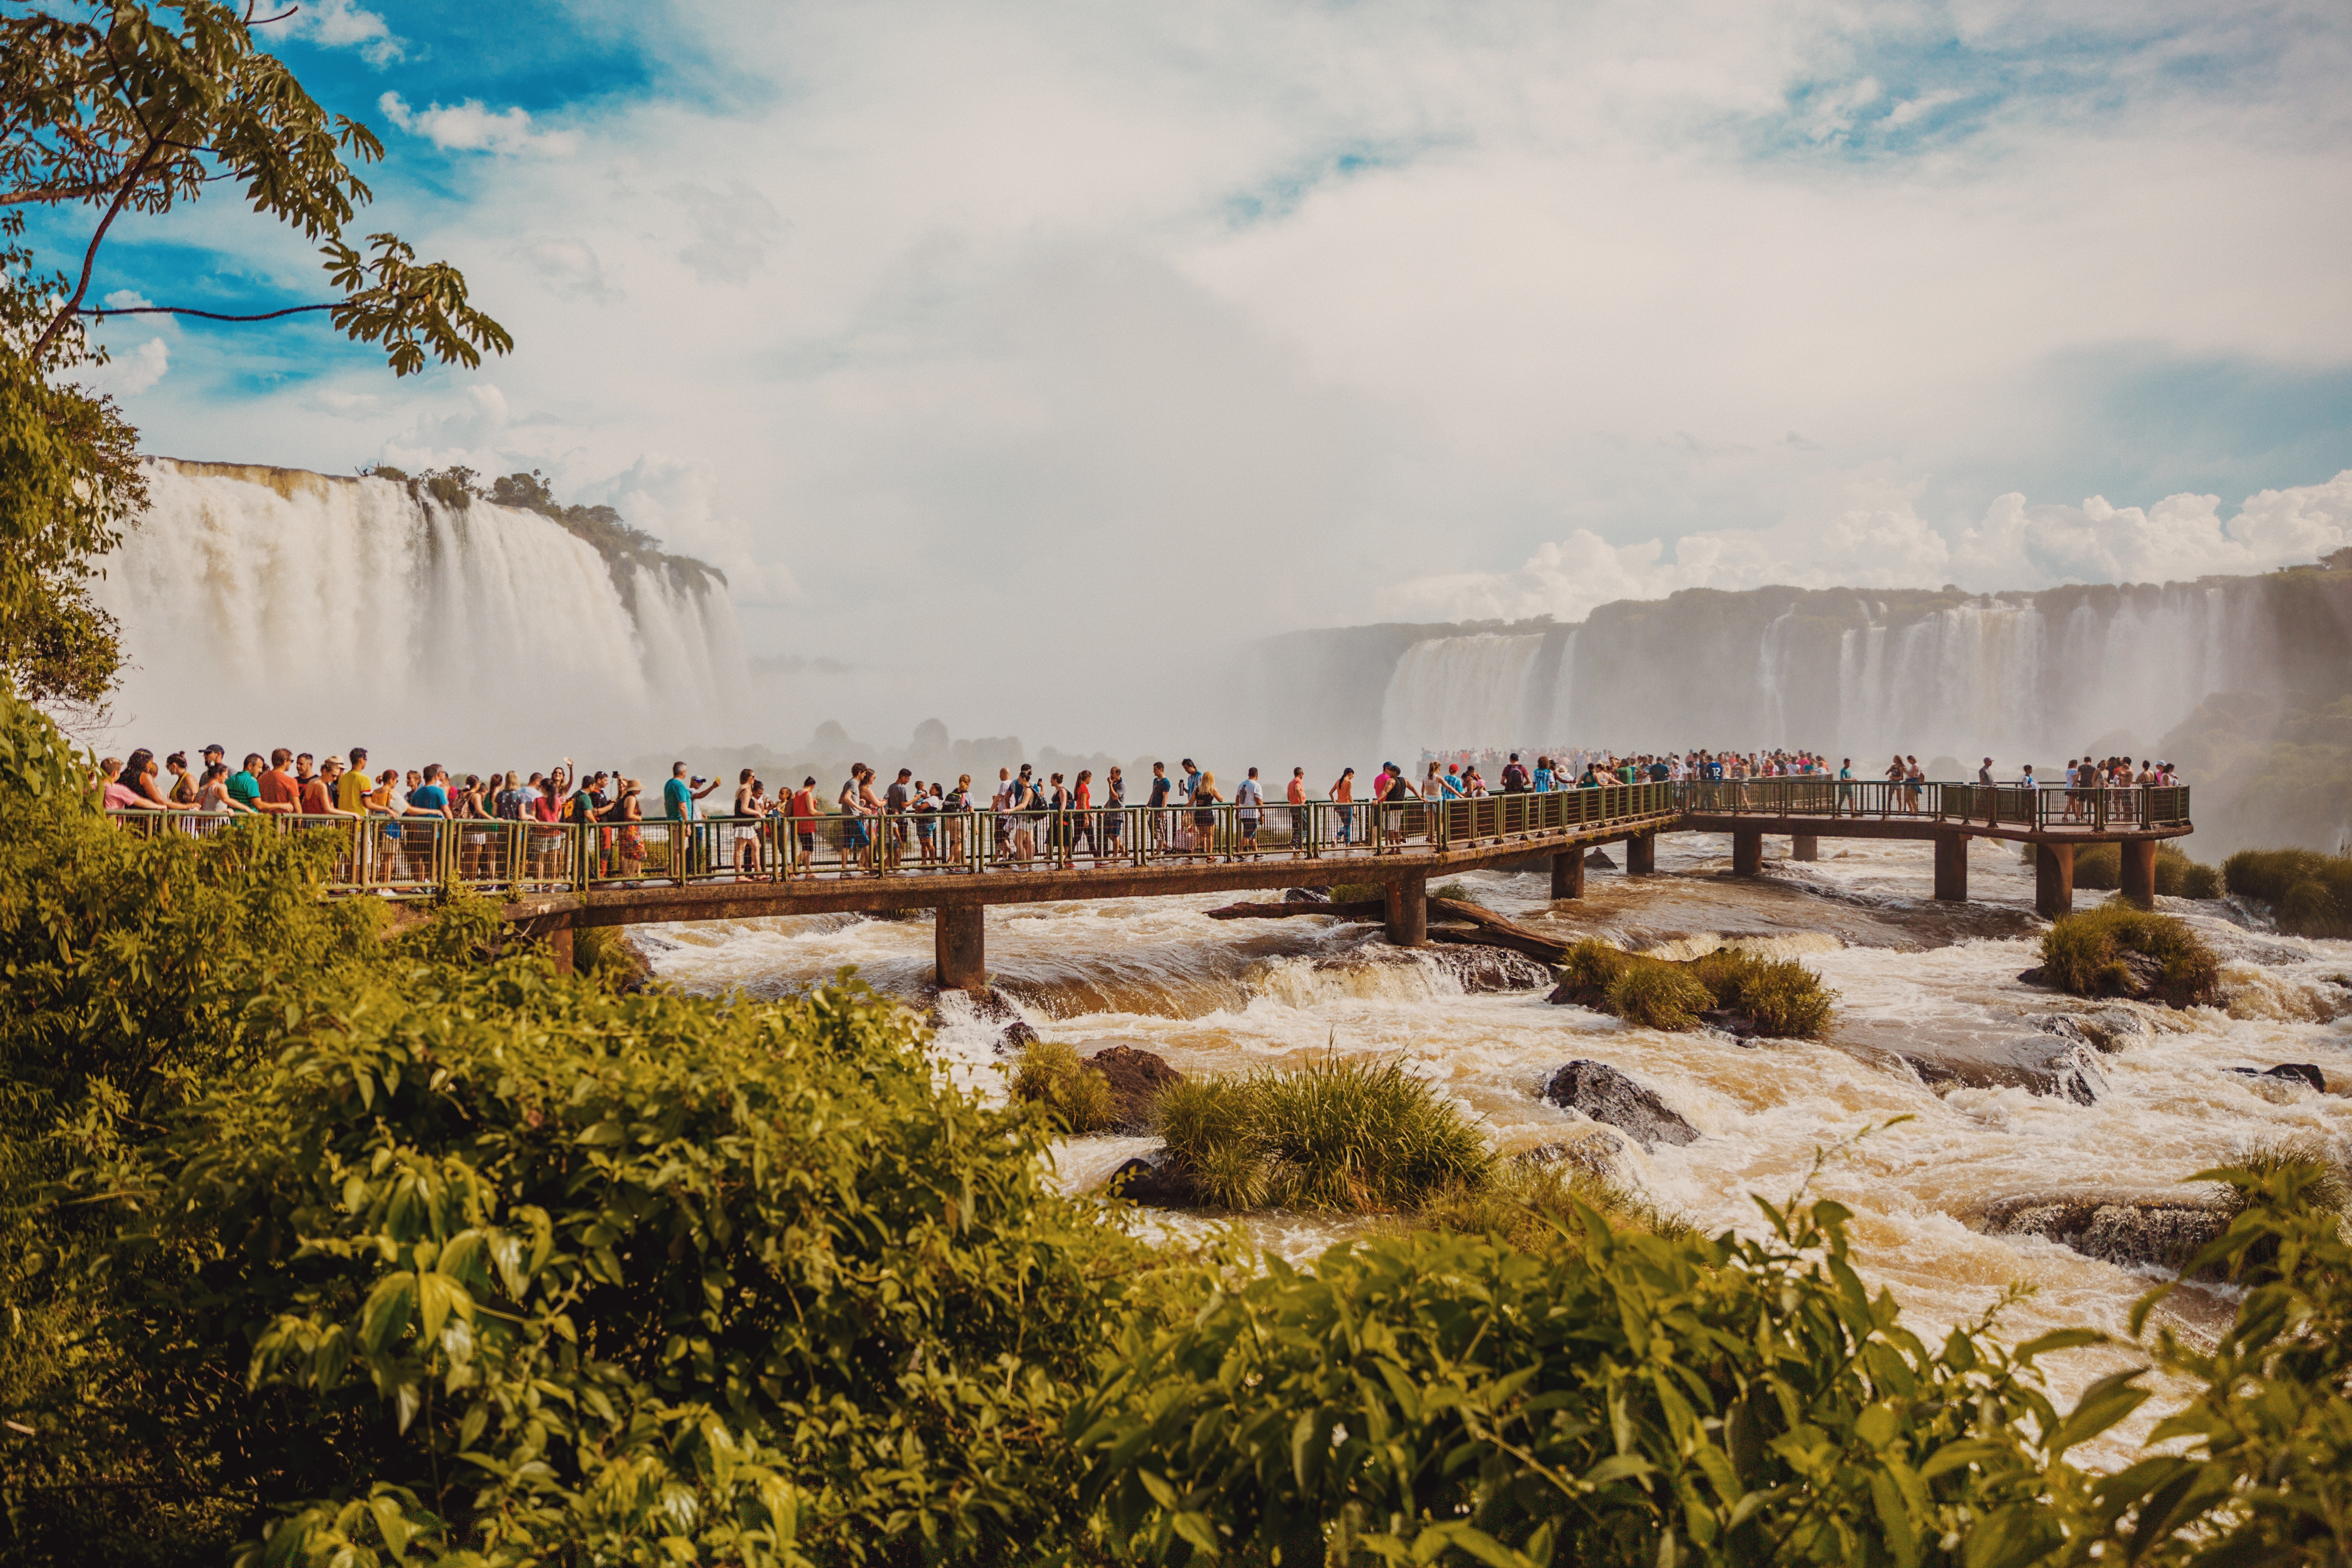 Black Panther – Argentina's Iguazu Falls